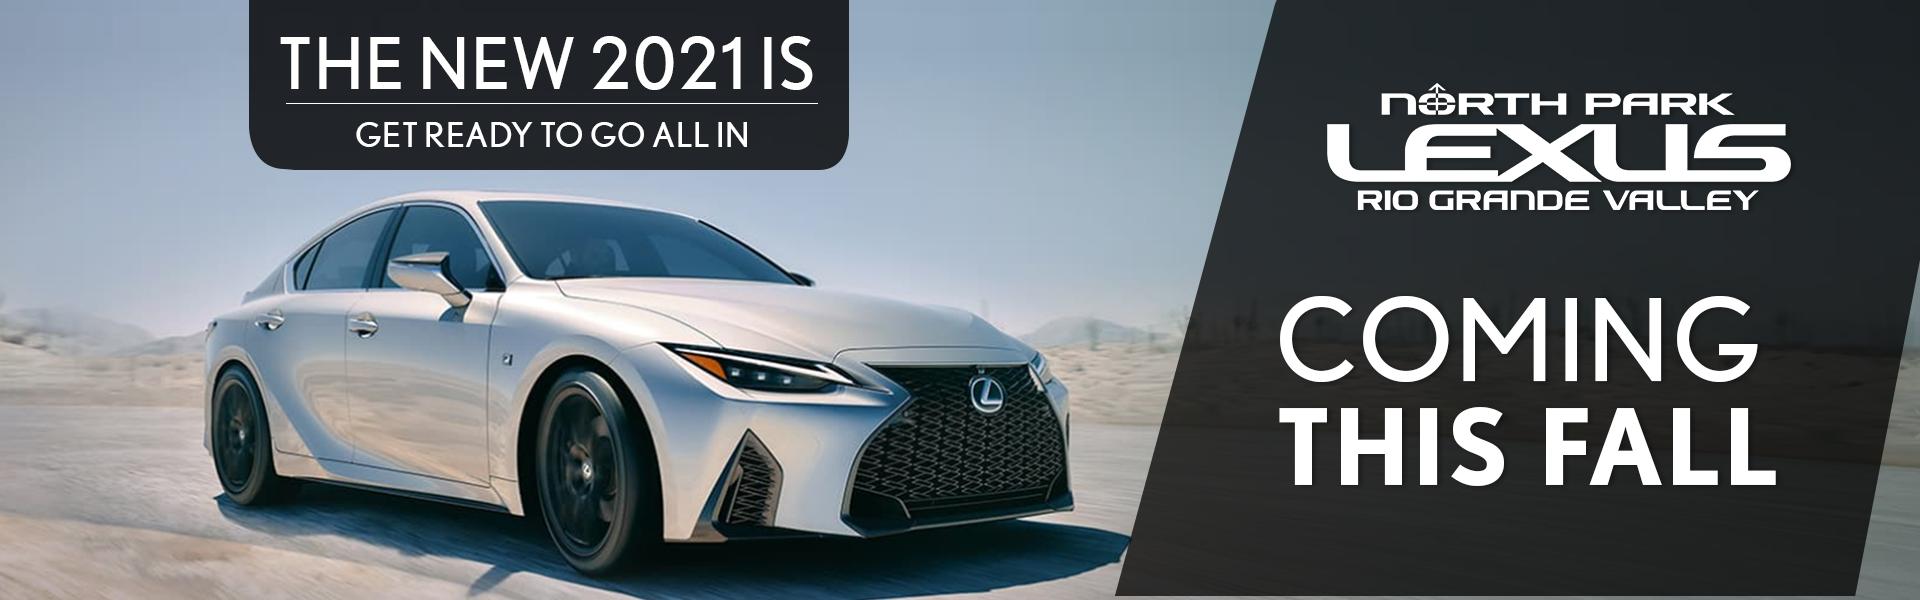 2021 Lexus IS Coming to North Park Lexus RGV